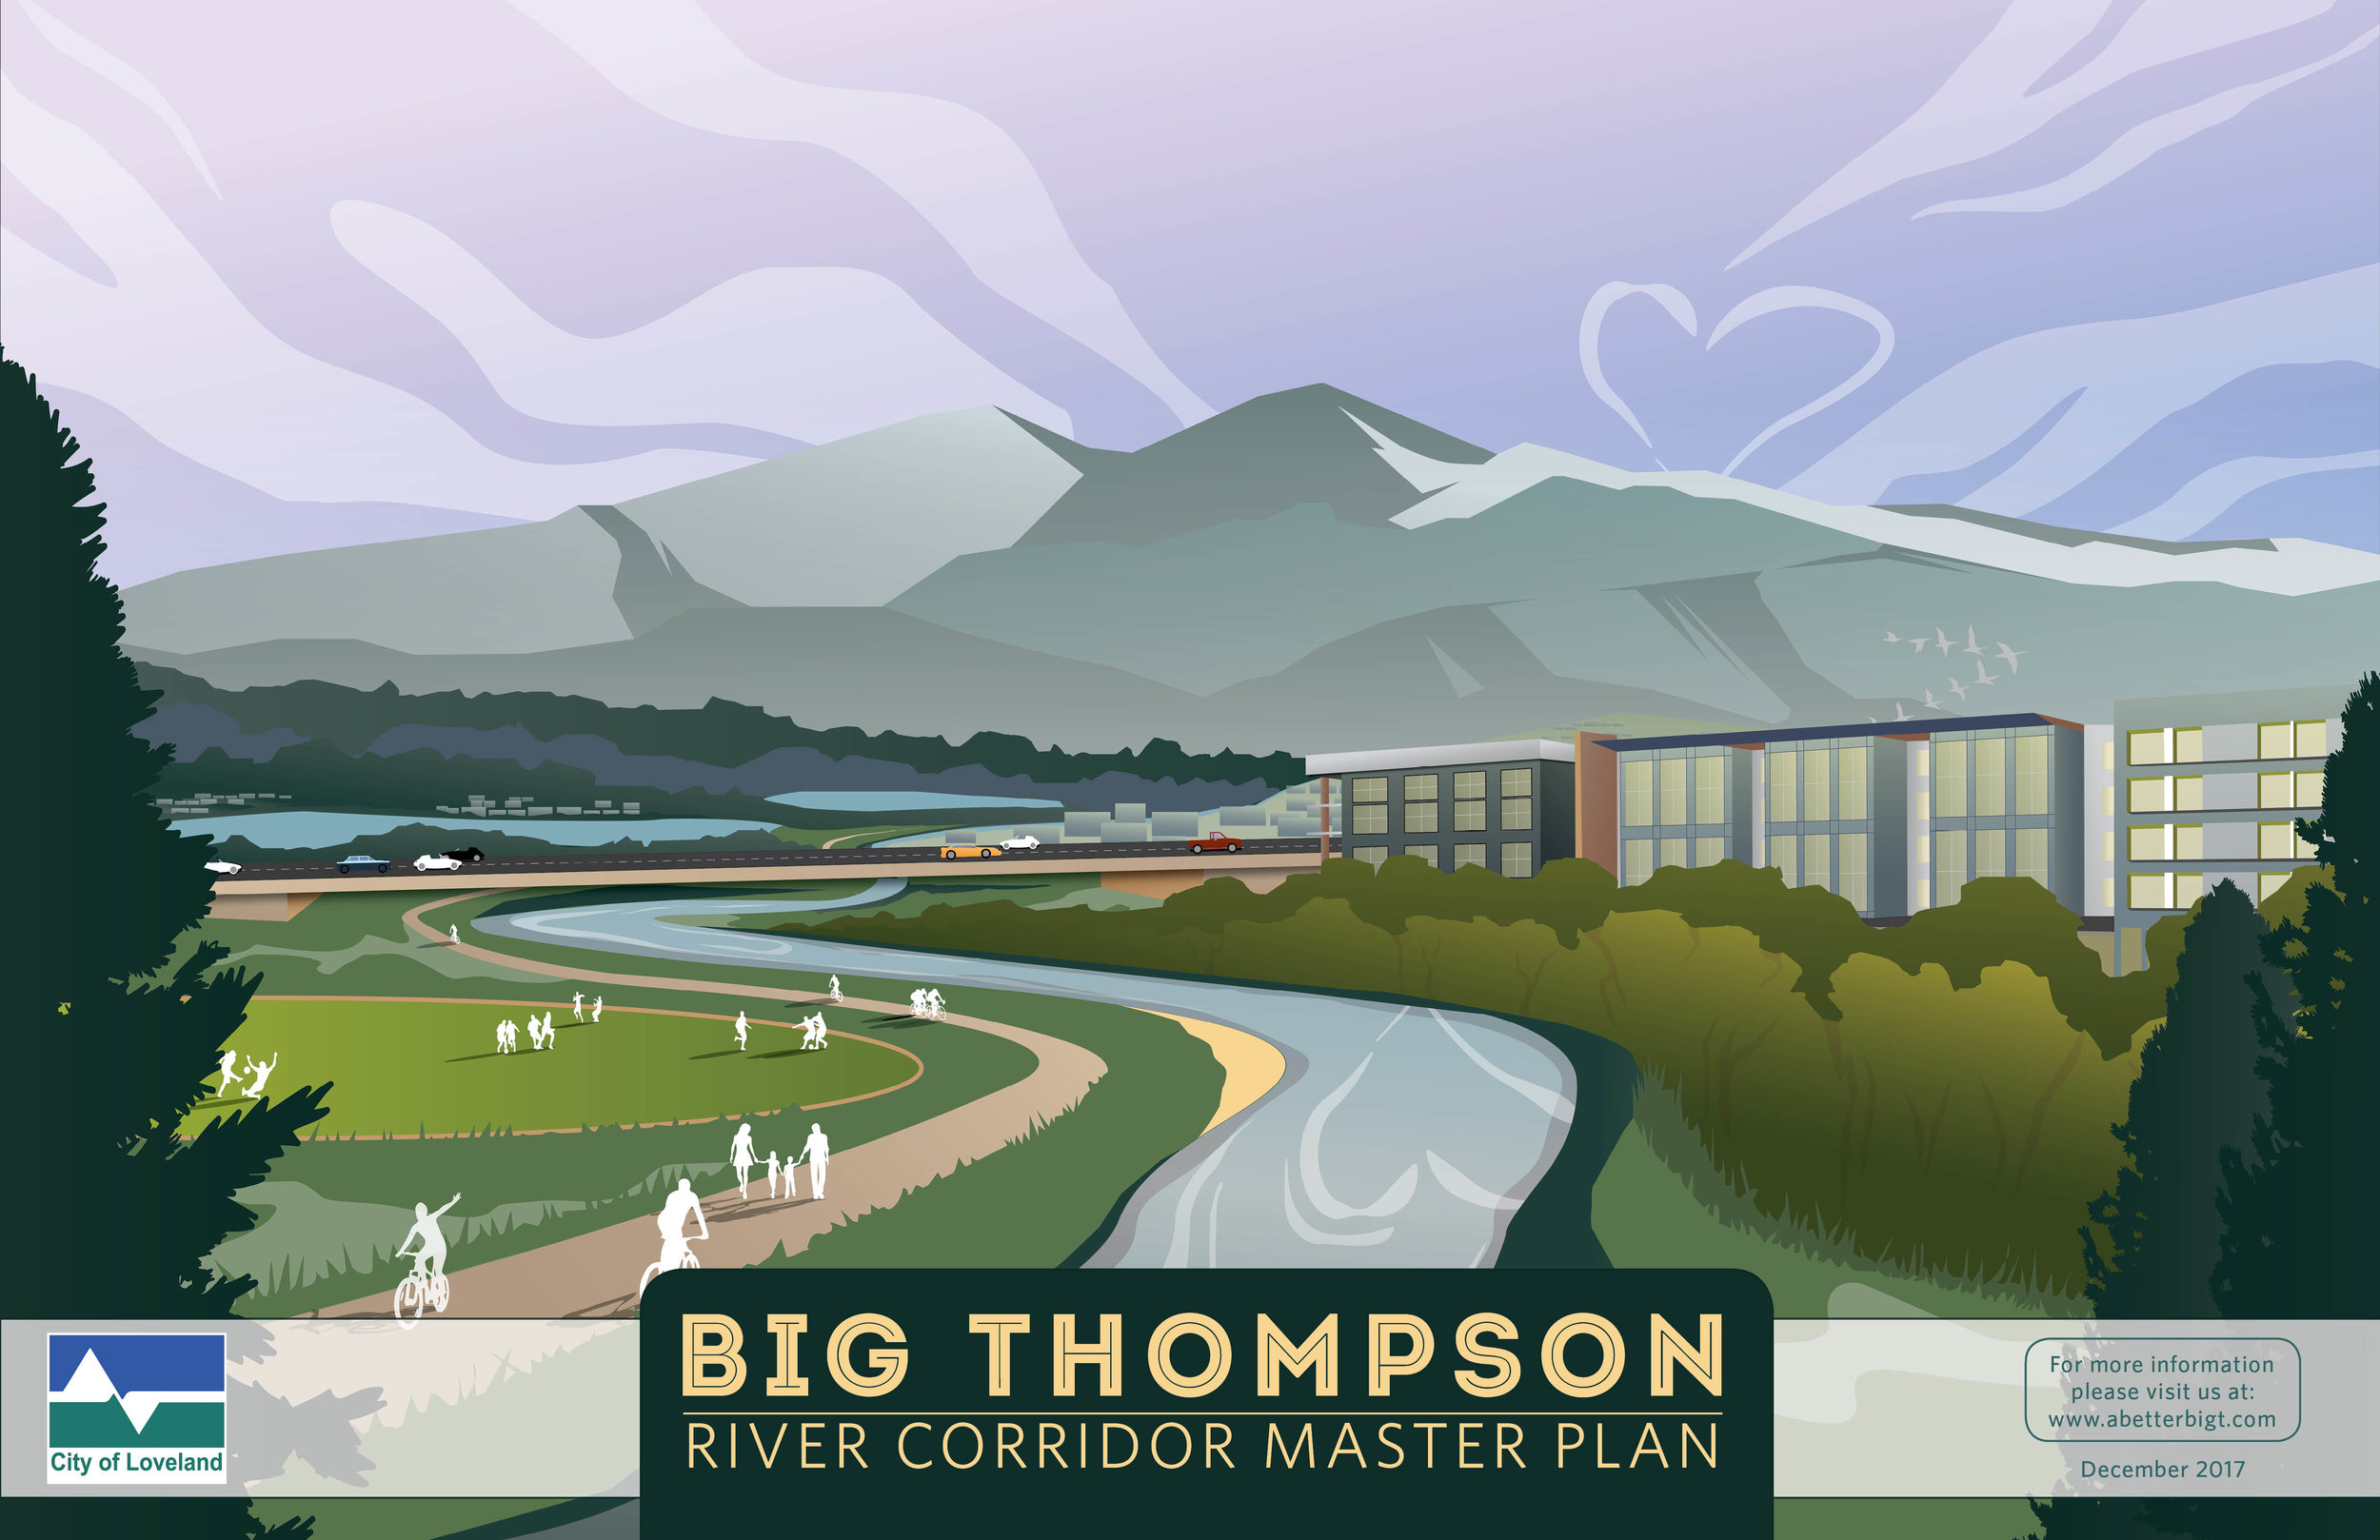 Big Thompson River Corridor Master Plan